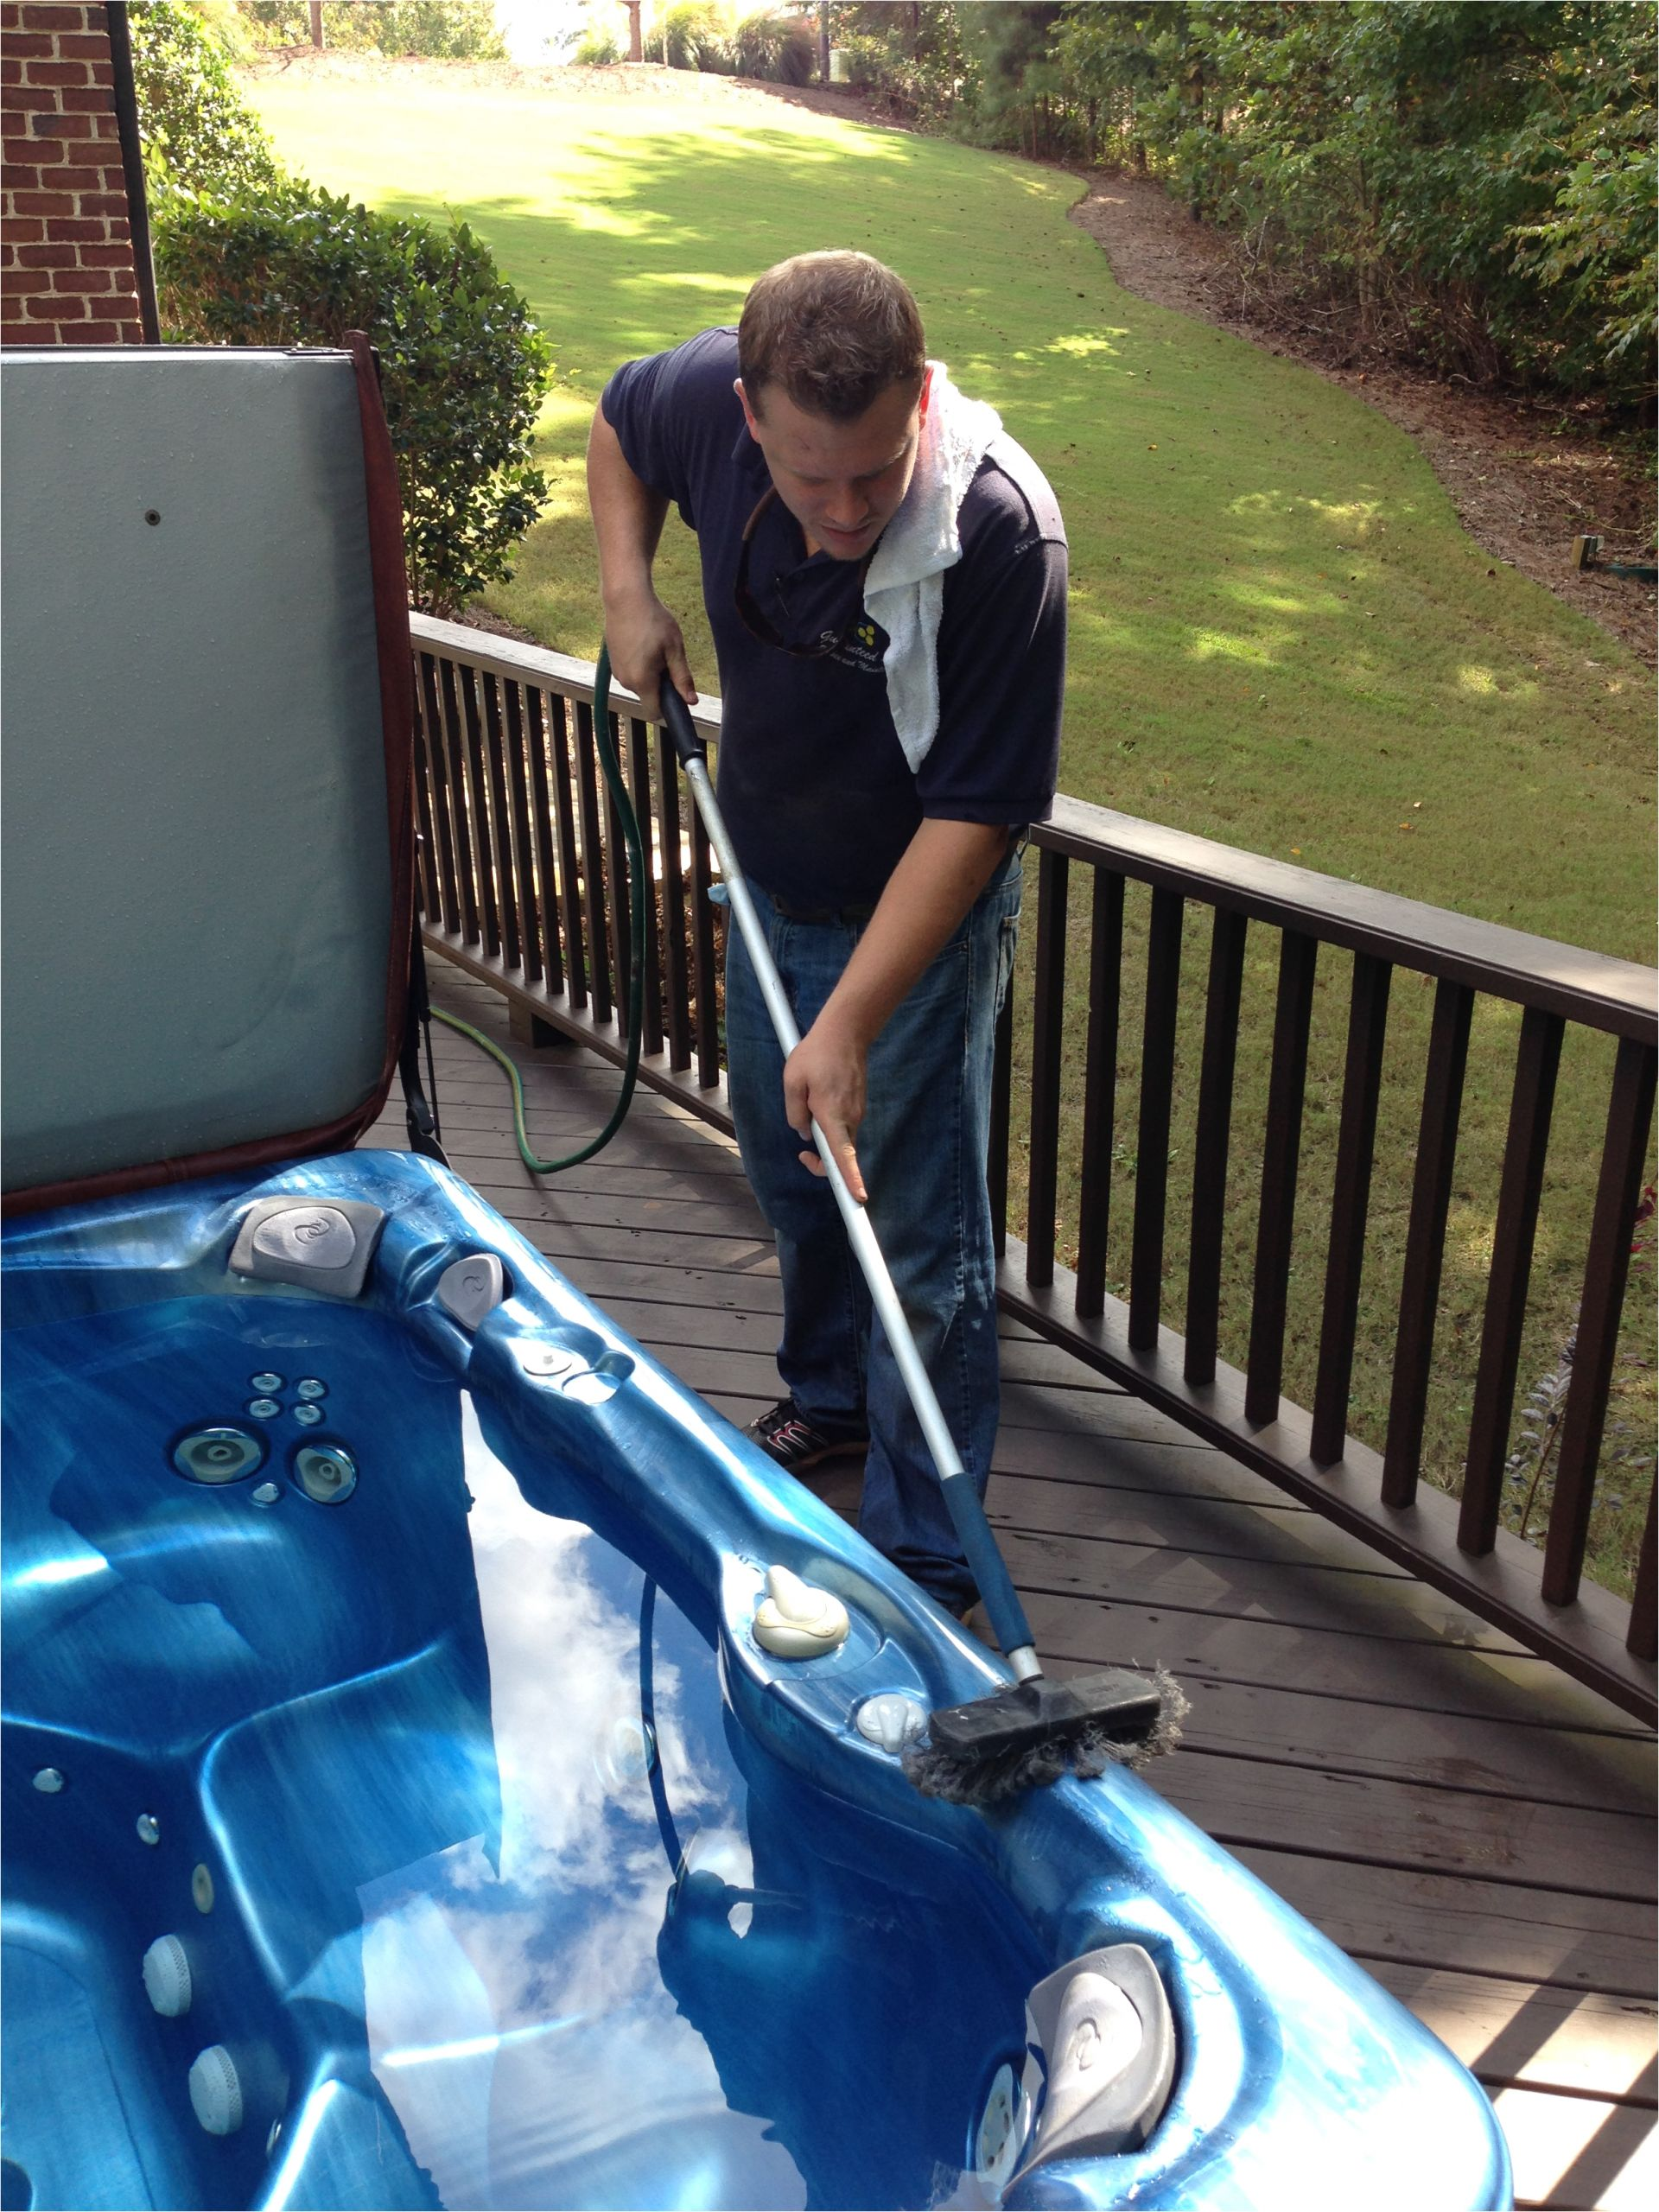 Jacuzzi Bathtub Maintenance Hot Tub Service and Repairs